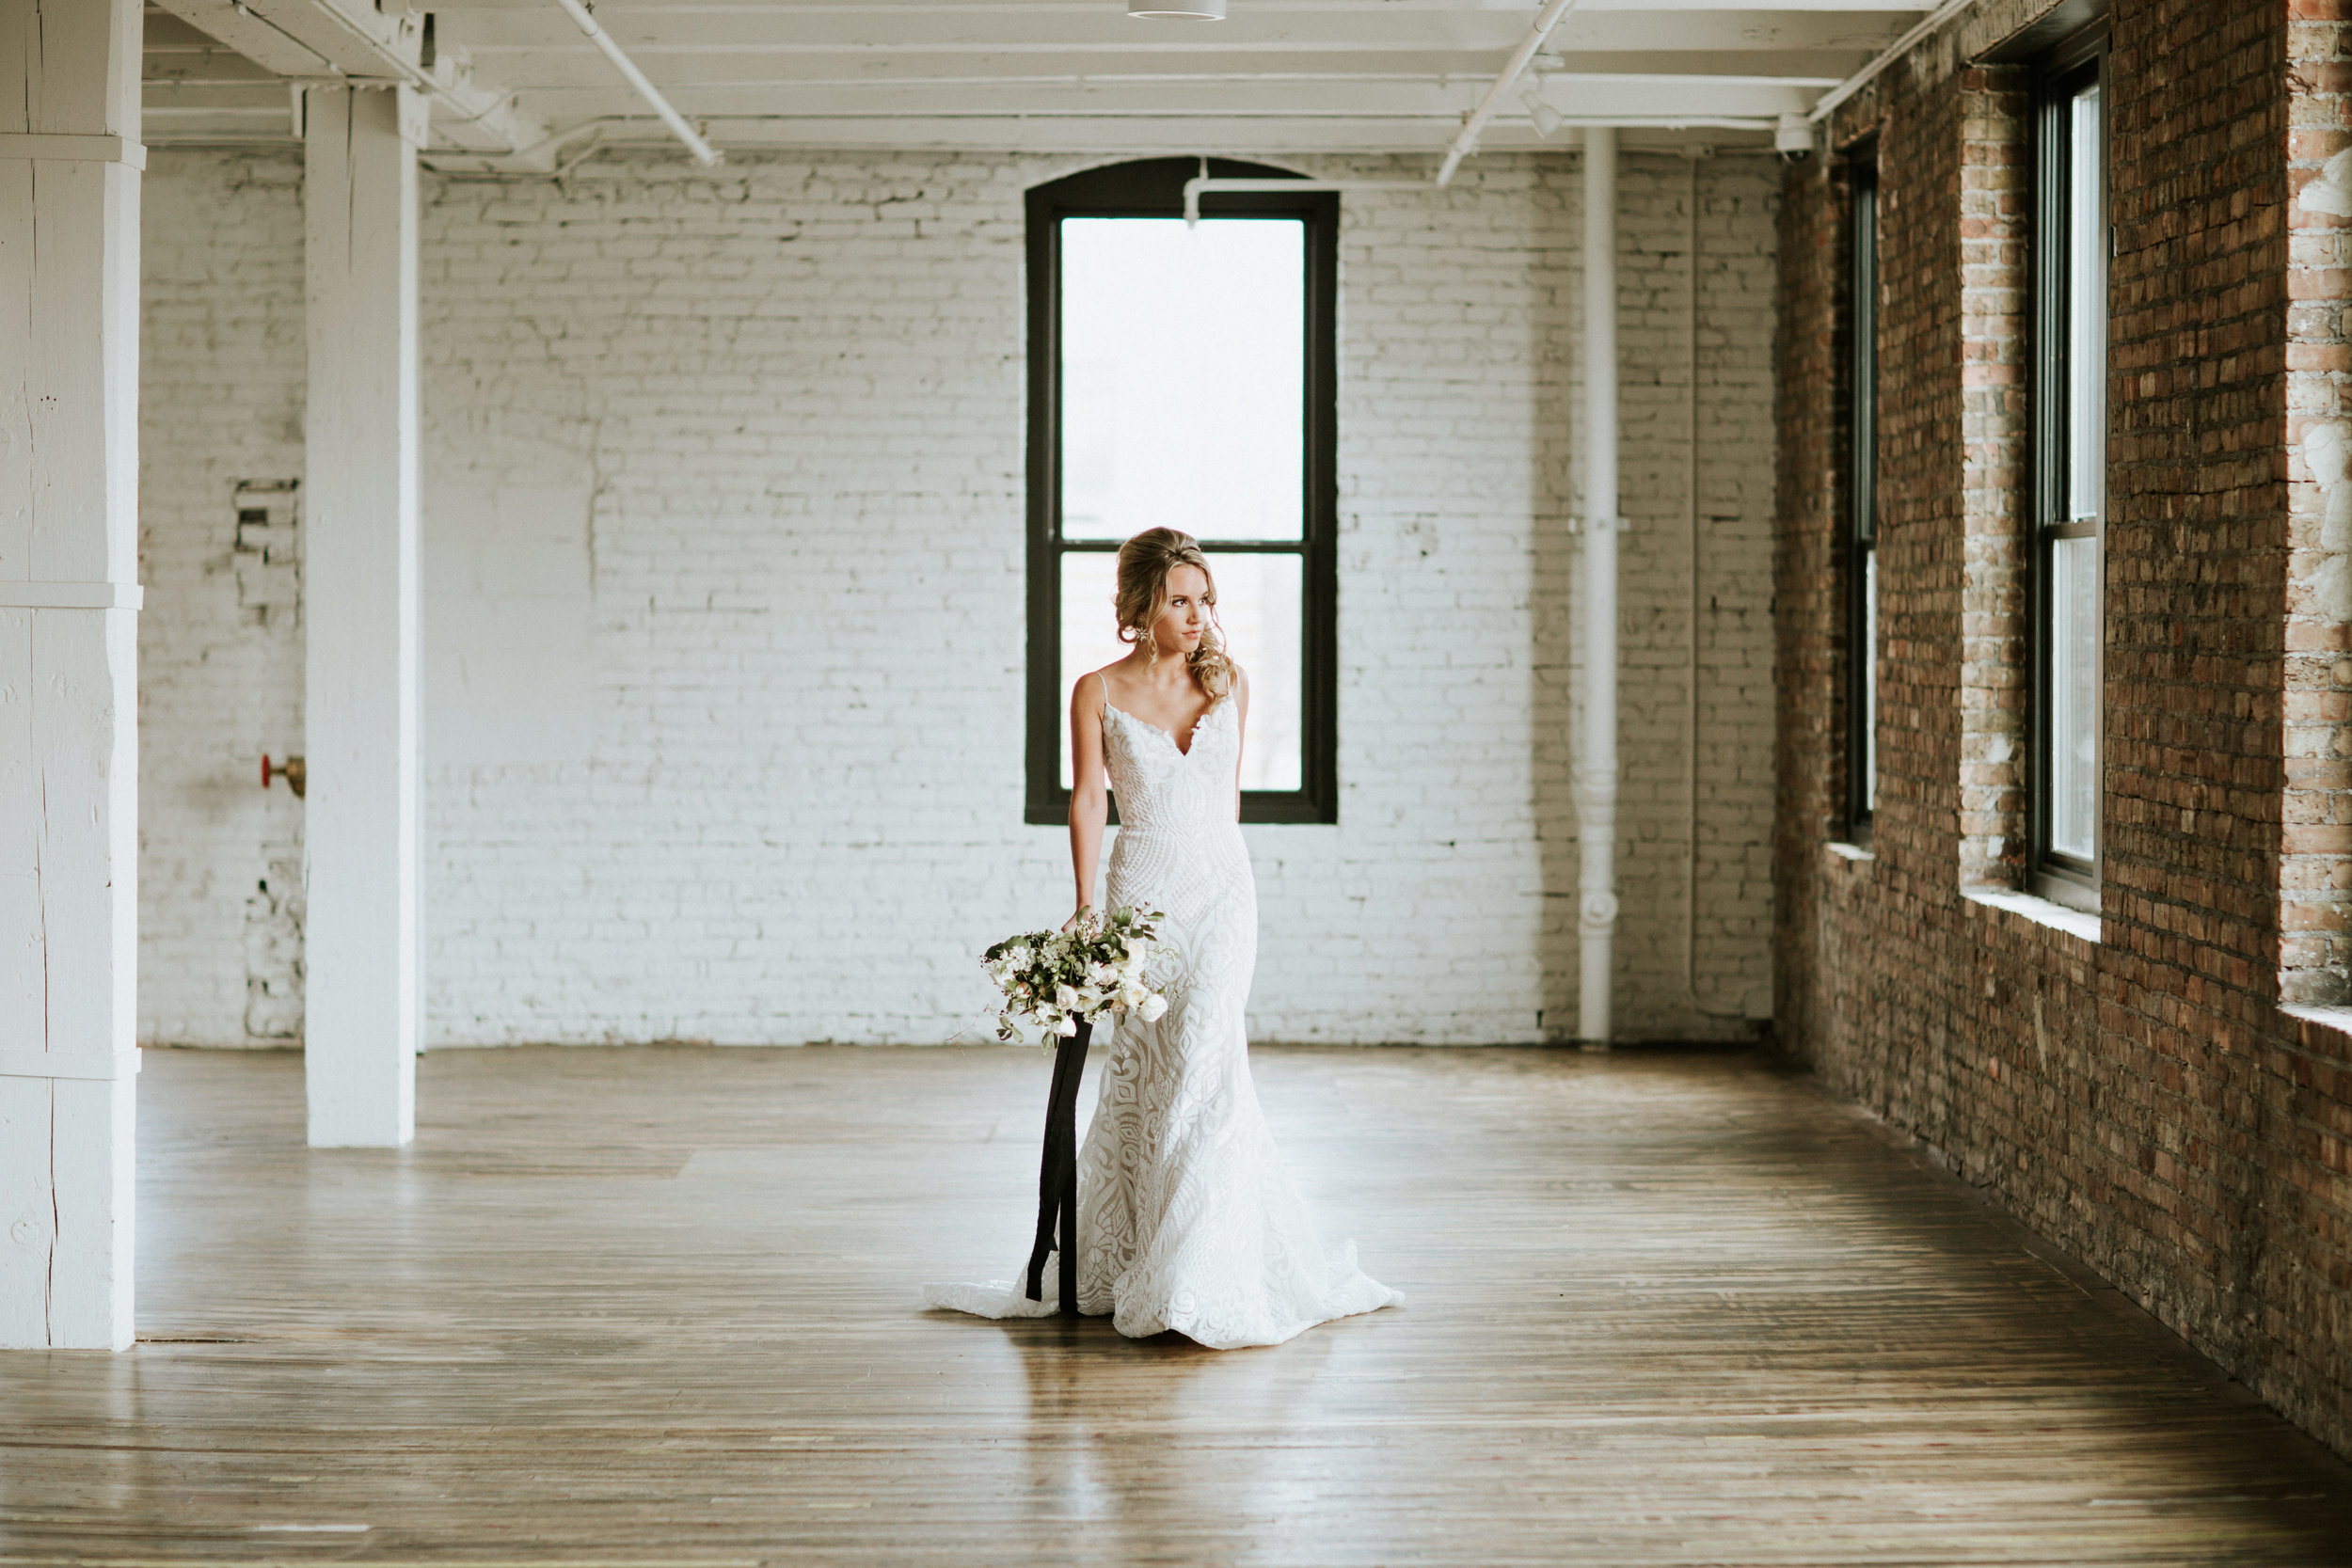 company-251-wedding-shoot-full-resolution-043.jpg